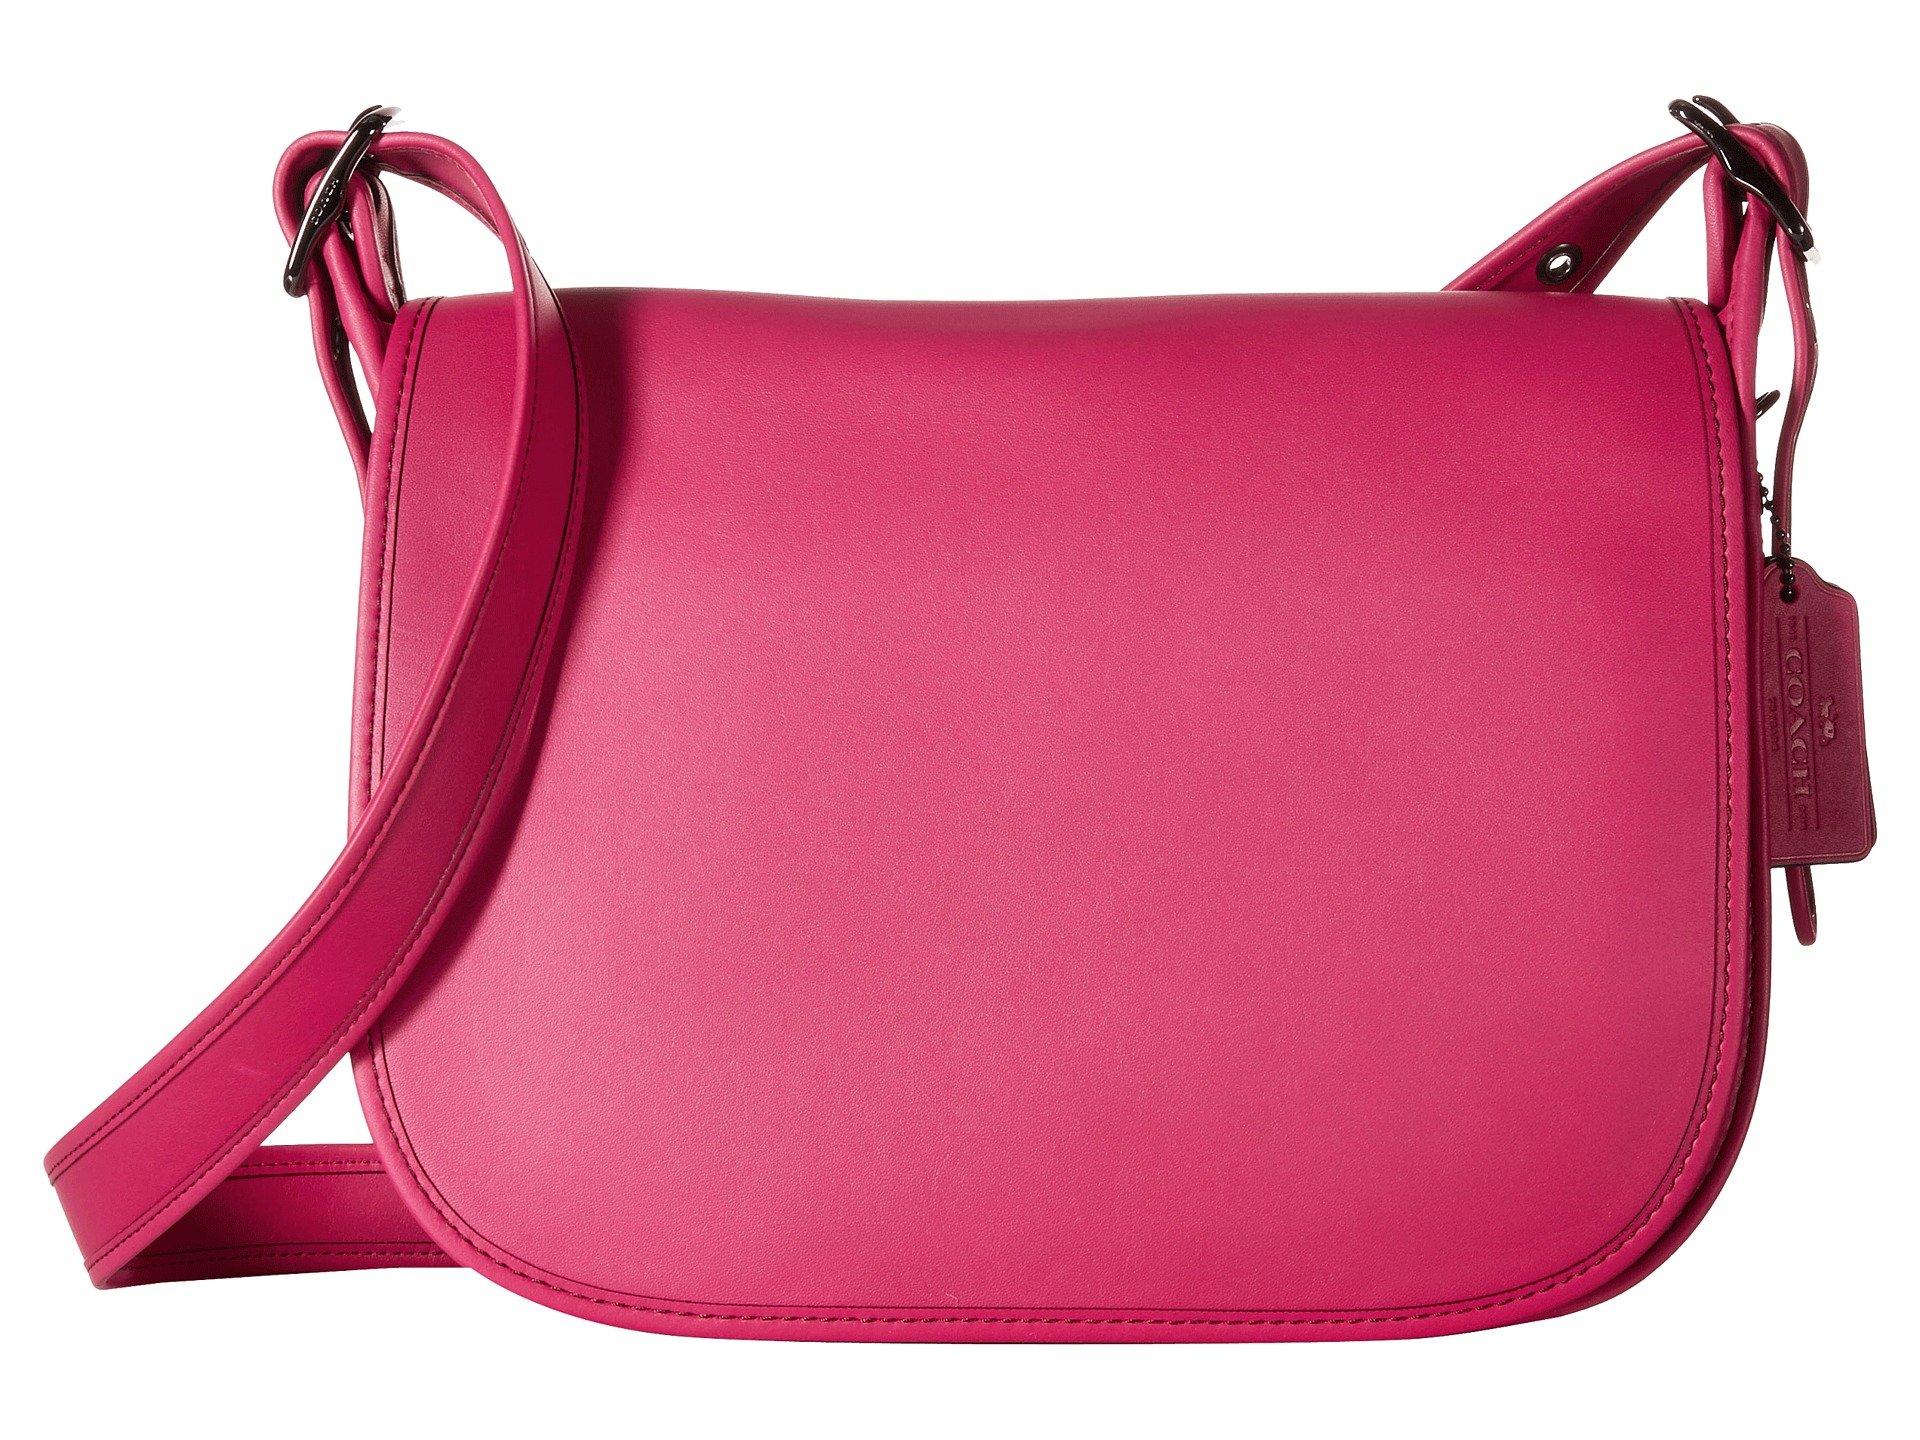 COACH Women's Gloveton Leather Saddle Bag DK/Cerise Cross Body